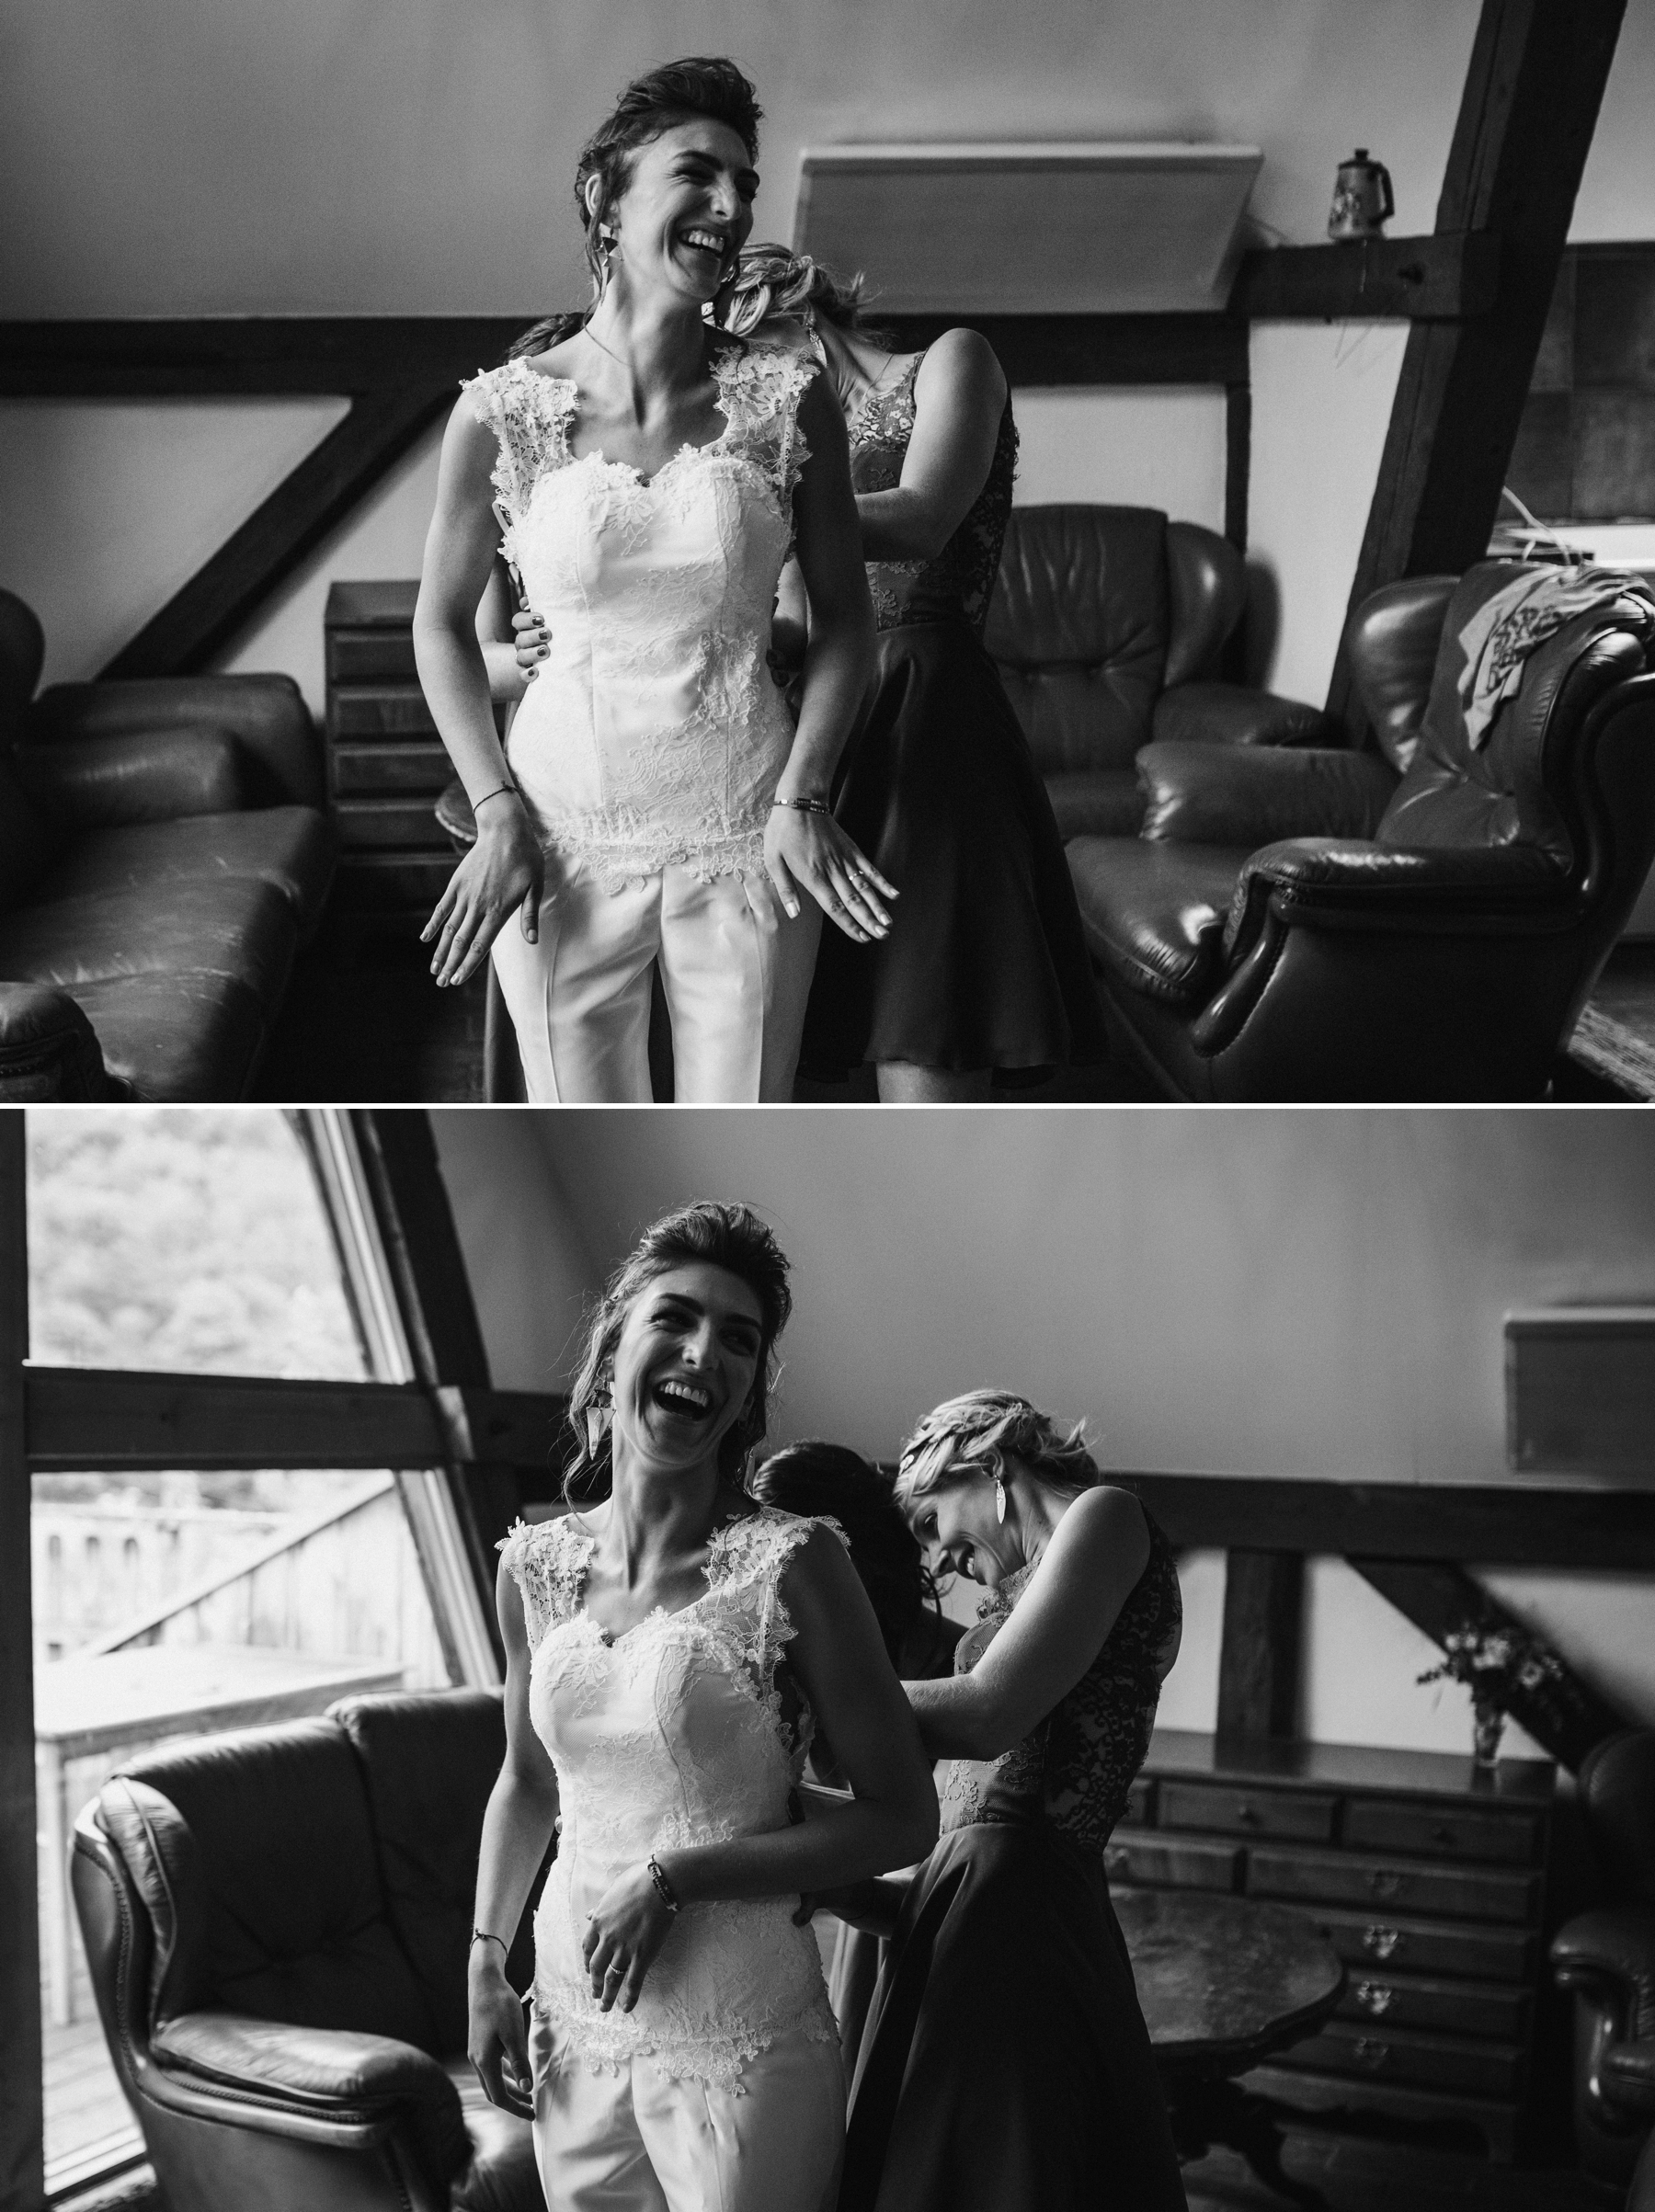 mariage-relais-gensbourg-raphaelmelka-03.jpg